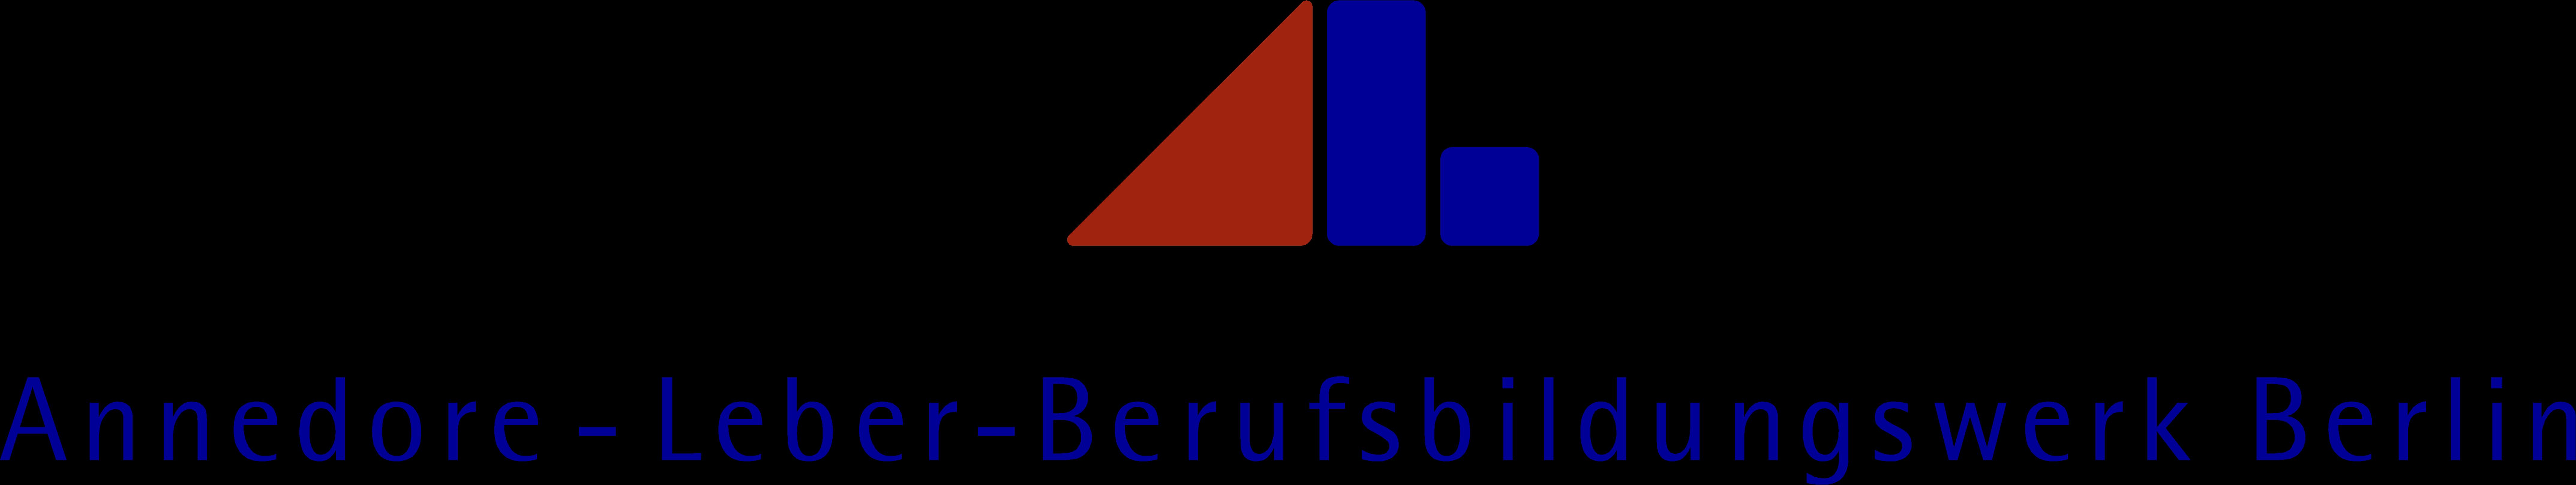 Annedore Leber BBW Berlin